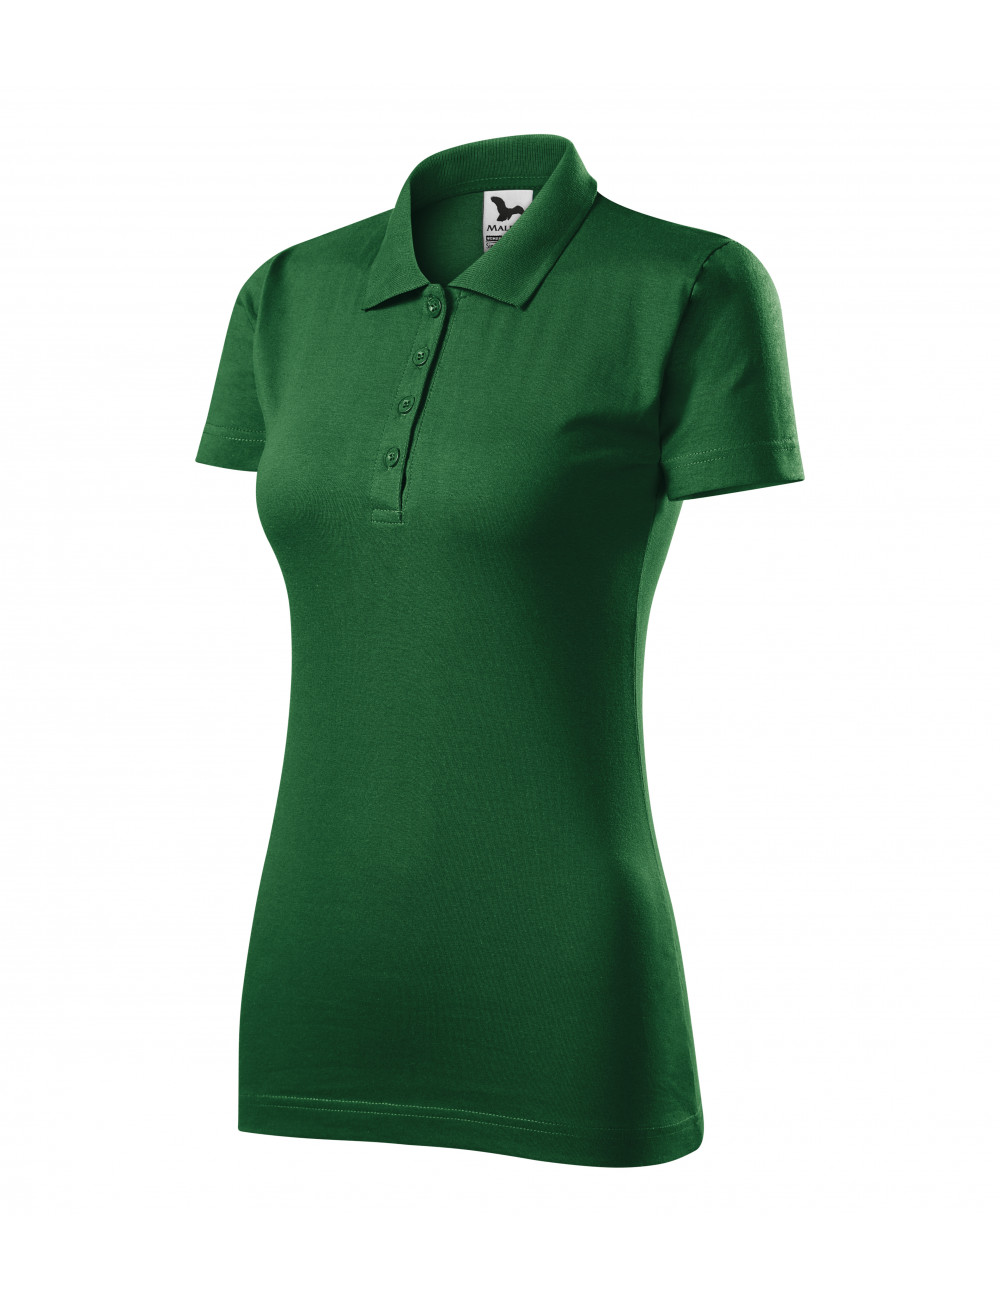 Adler MALFINI Koszulka polo damska Single J. 223 zieleń butelkowa